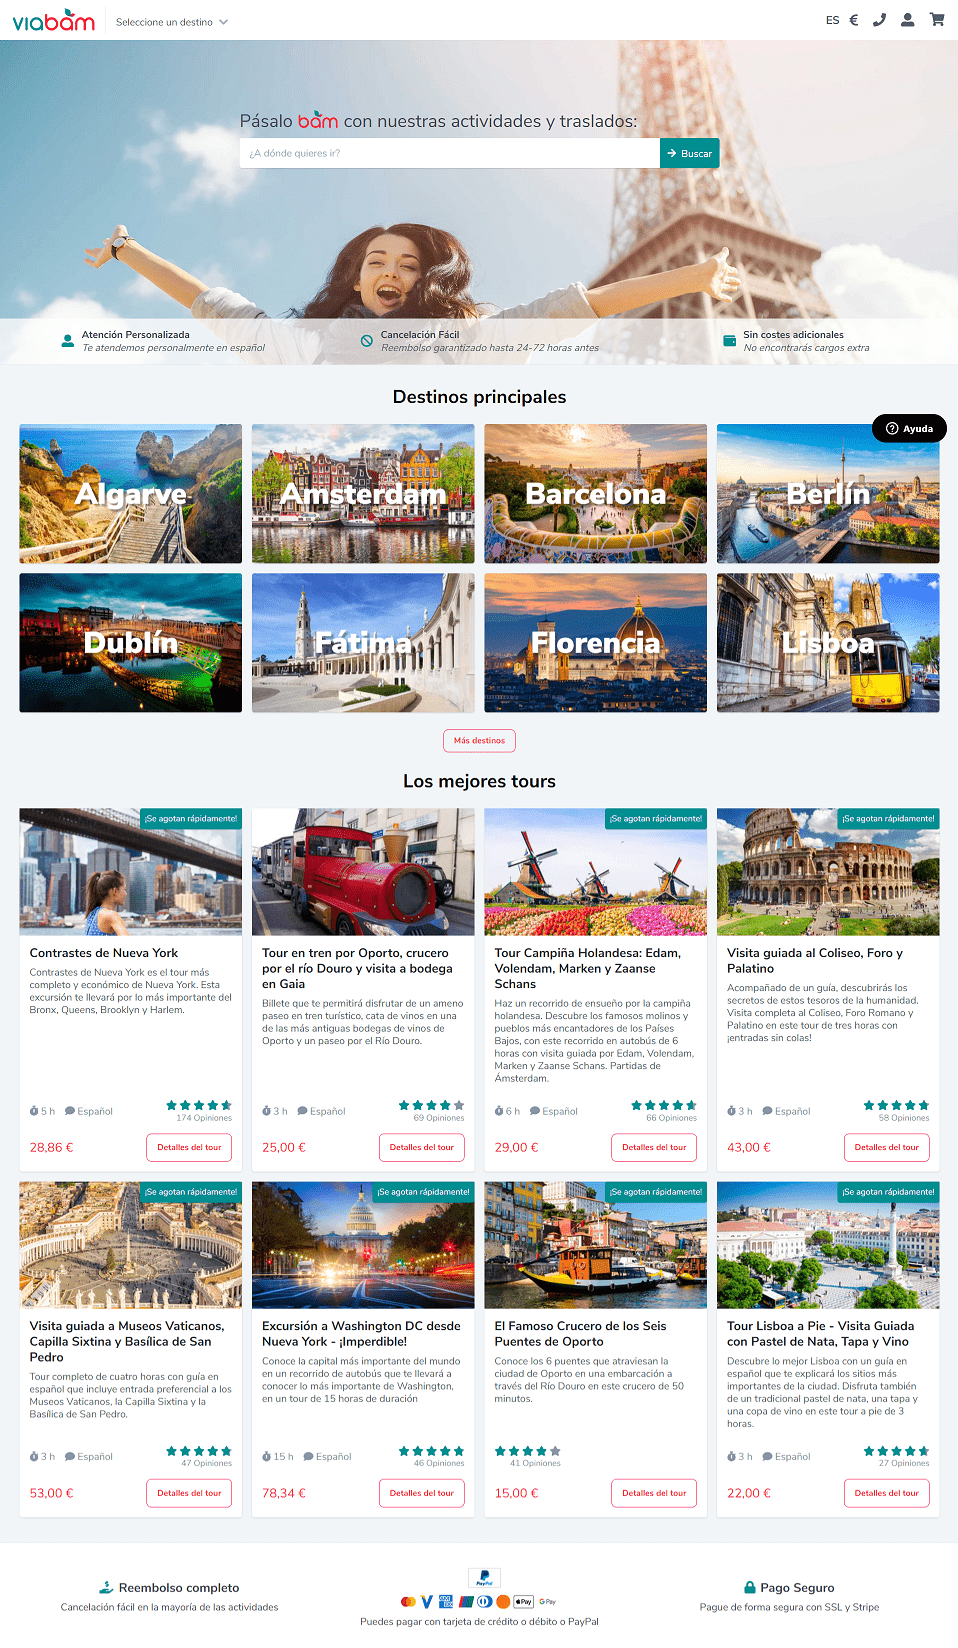 viabam-homepage